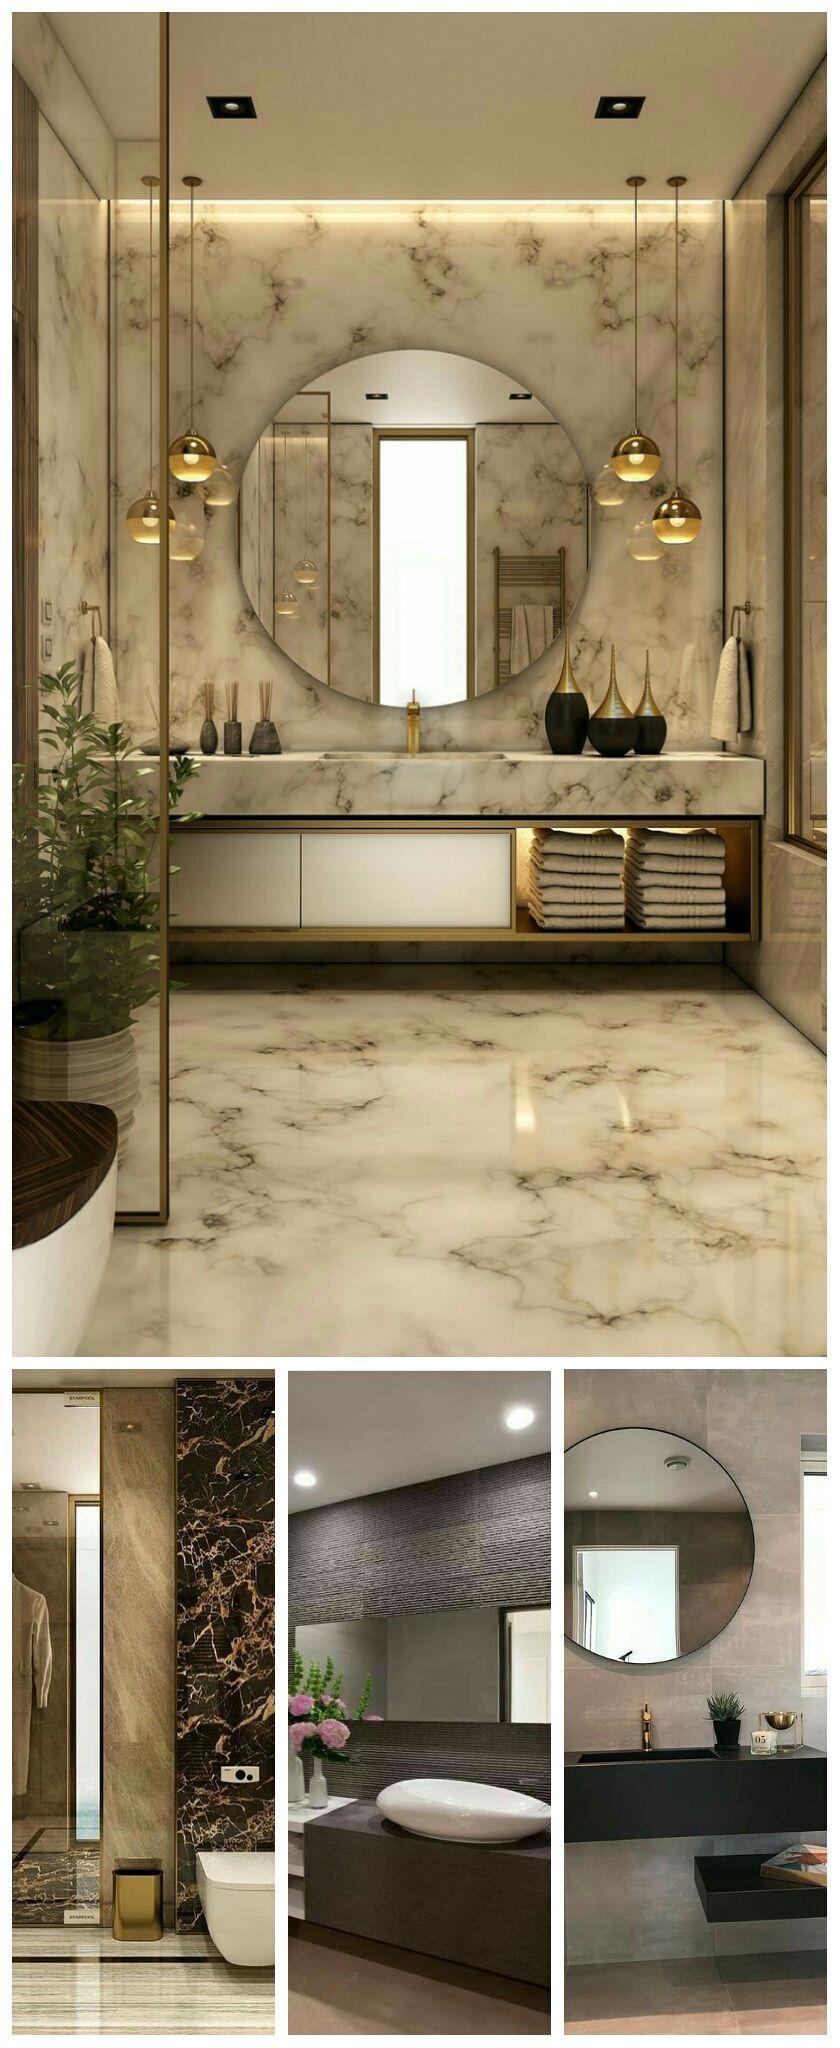 Washroom Decor Ideas Teal And Brown Bathroom Decor Grey Silver Bathroom Accessorie Luxury Bathroom Master Baths Top Bathroom Design Luxury Master Bathrooms